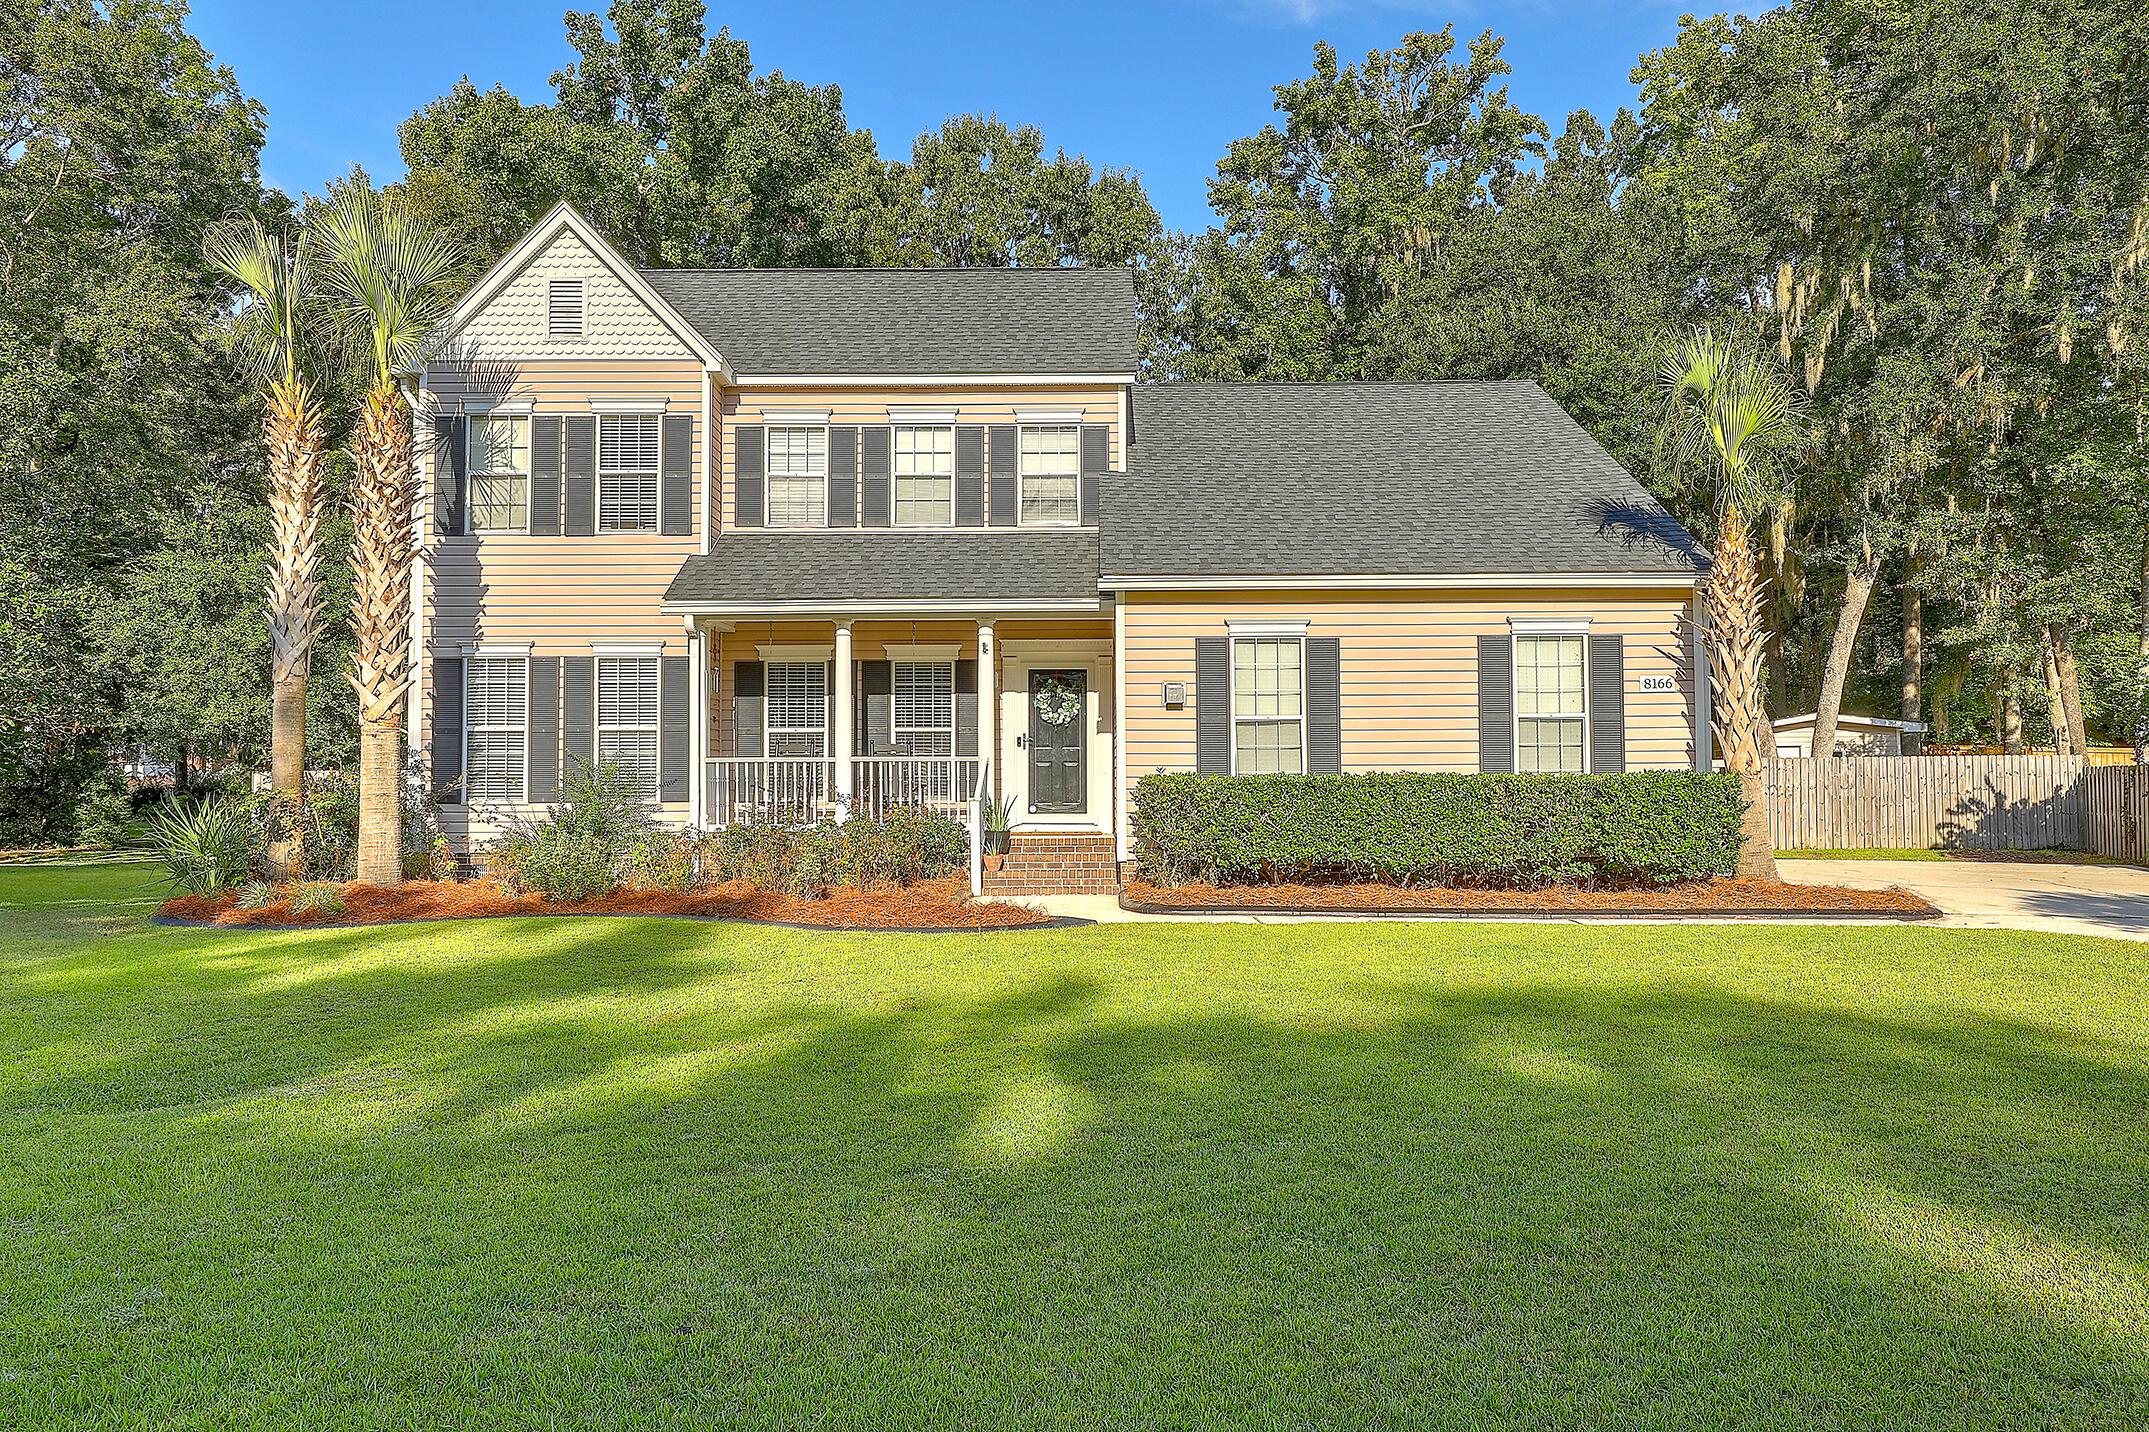 8166 Scottswood Drive Ext. North Charleston, SC 29418